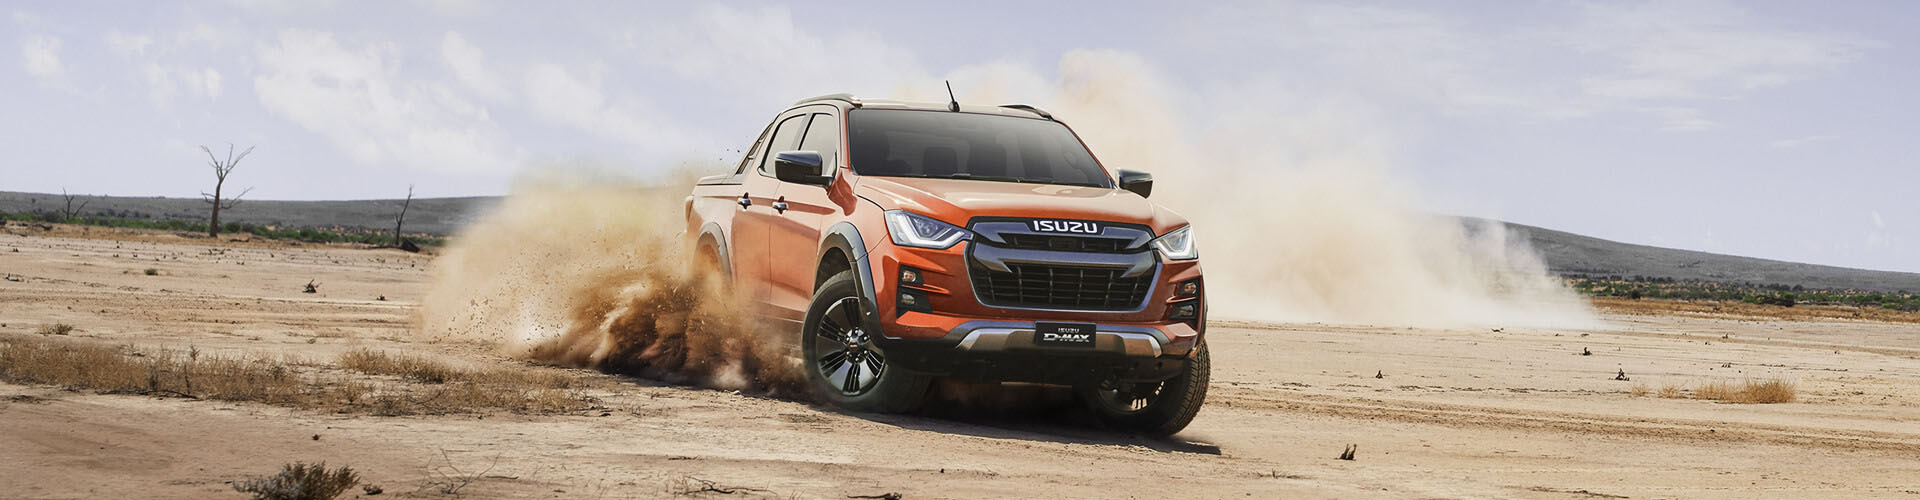 Jarvis Isuzu UTE | Used Car Upgrade Warranty